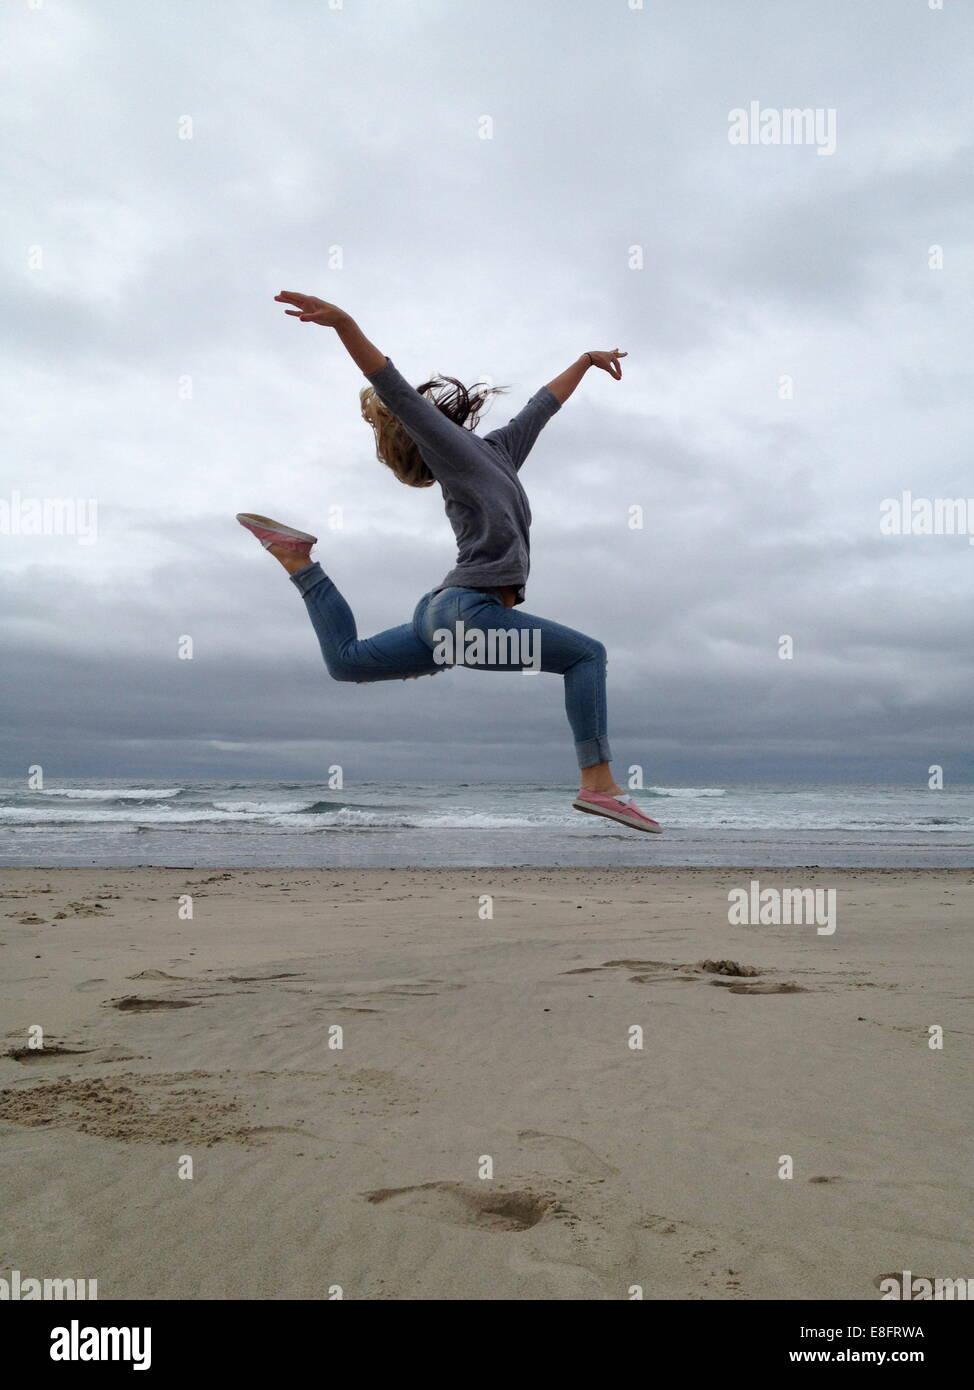 USA, New York, Columbia Comté, Rockaway Beach, young woman practicing ballet on beach Photo Stock